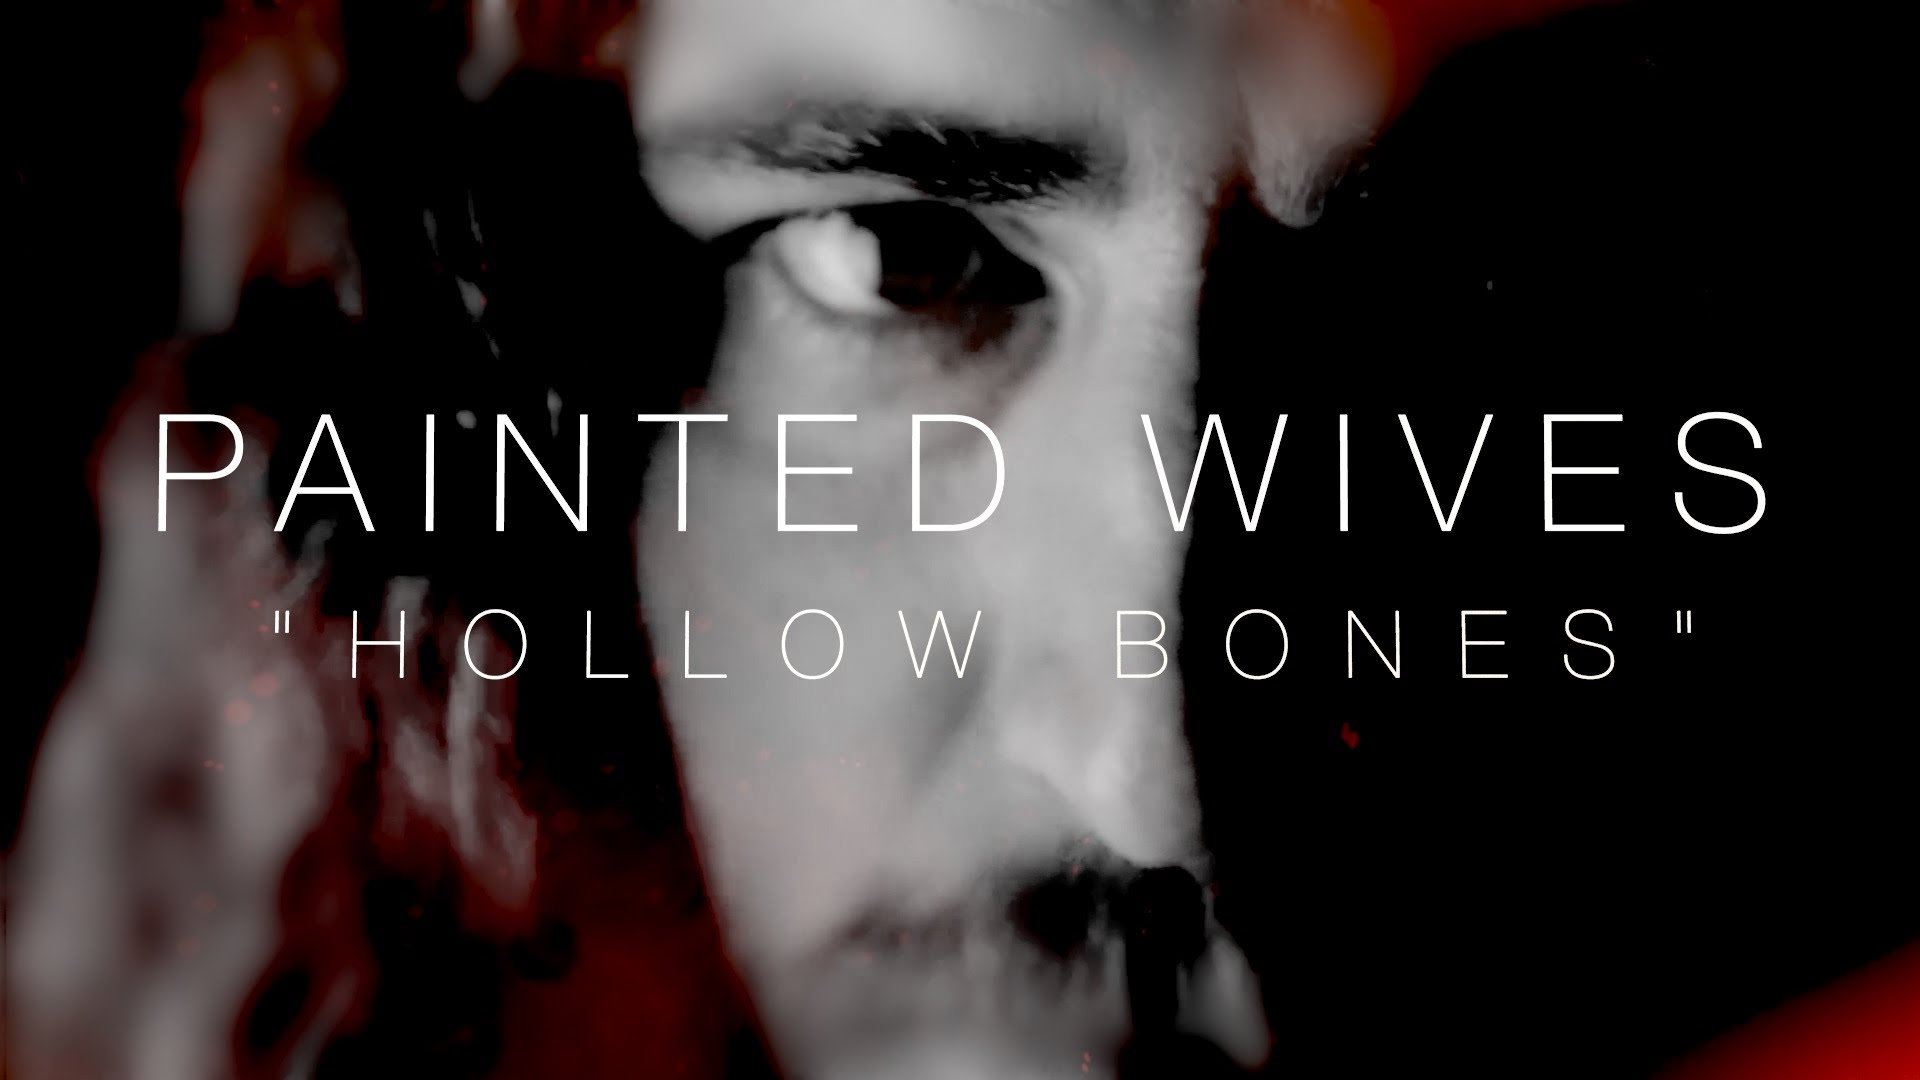 PAINTED WIVES - Hollow Bones (Lyric Video)